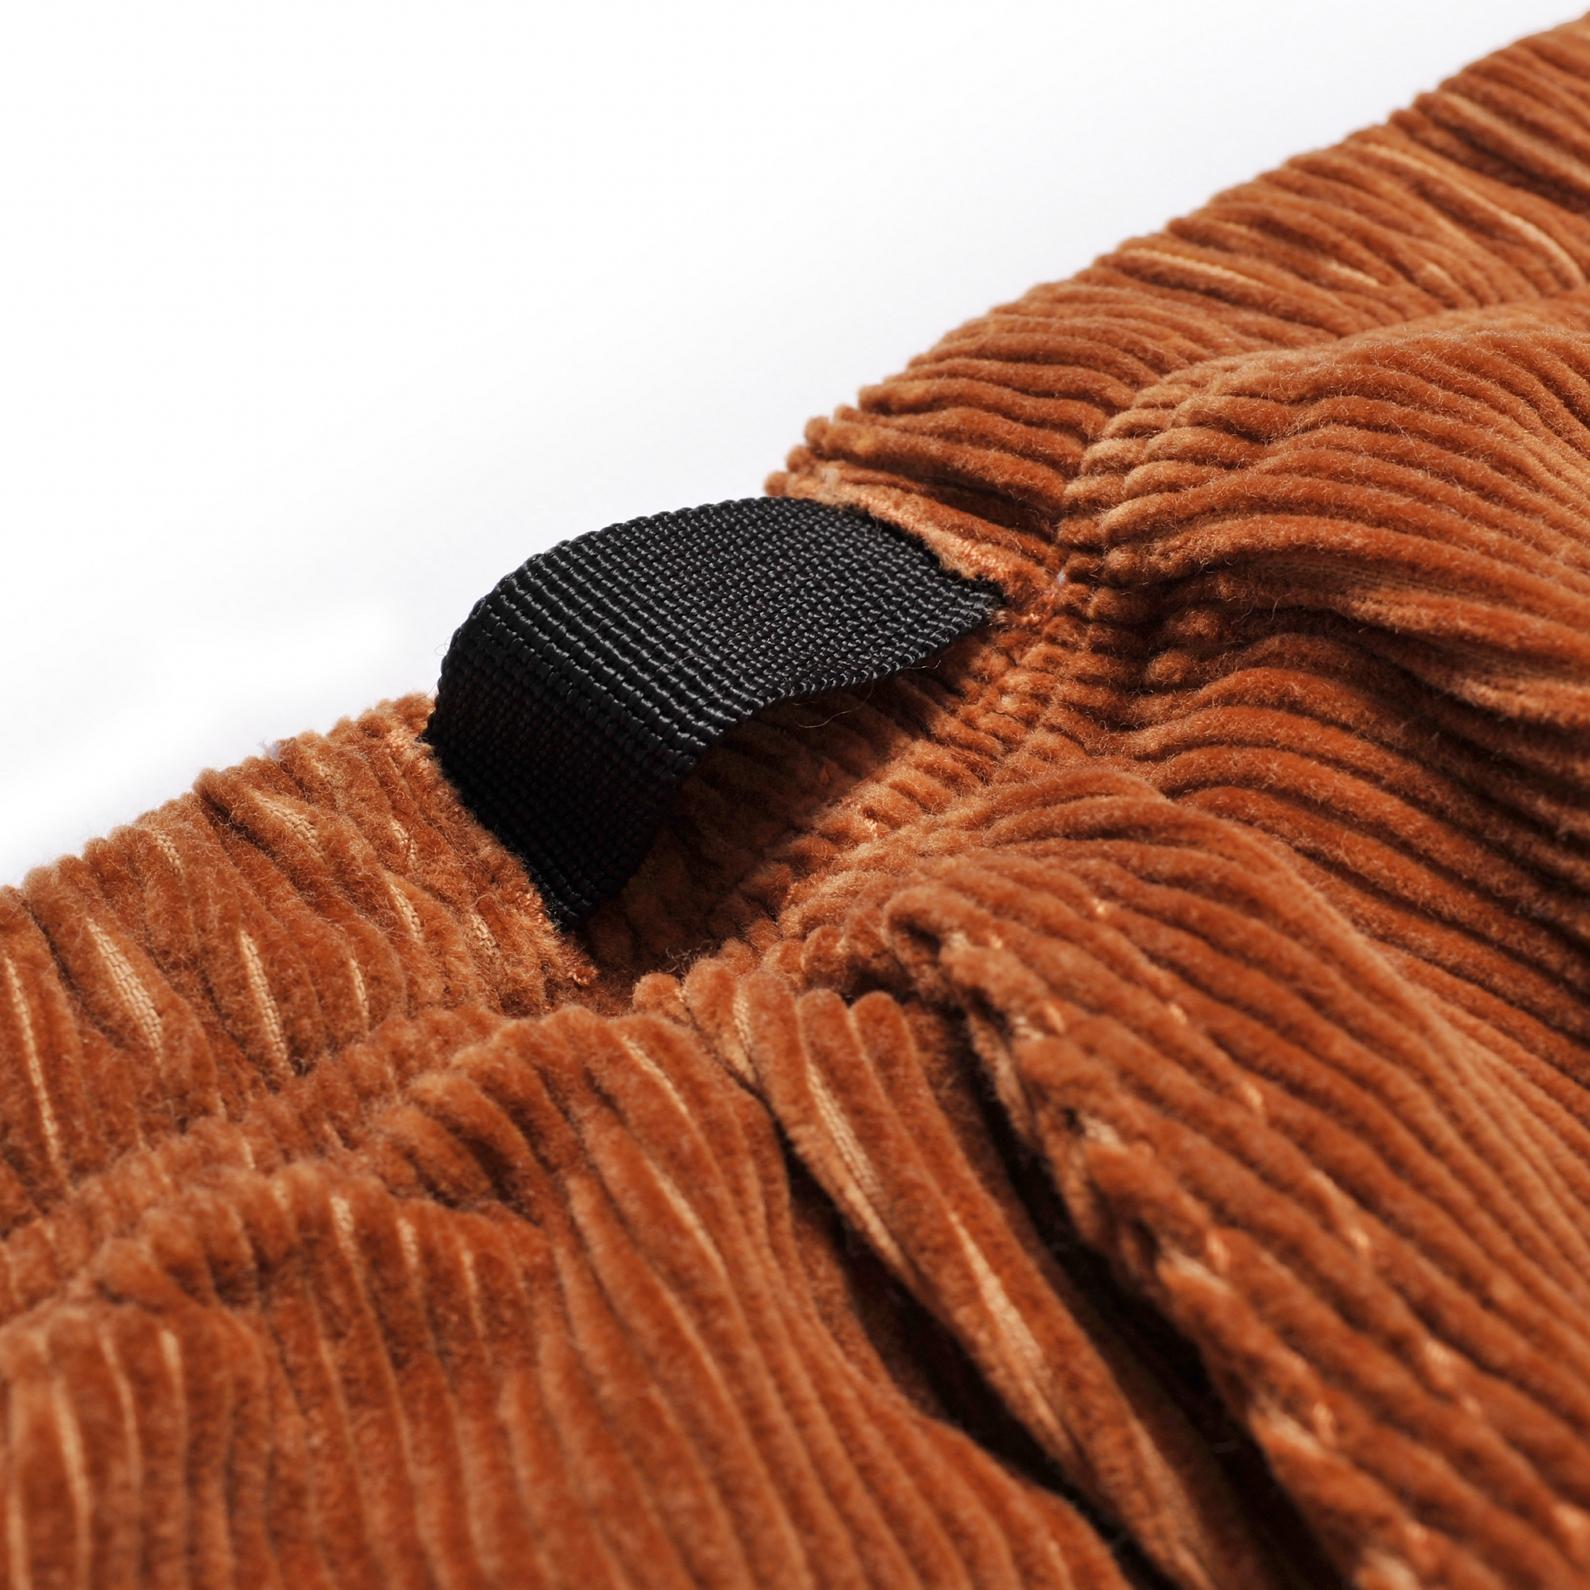 【RAVE SKATEBOARDS/レイブスケートボード】SPIKE CORDUROY CLIMBING PANT コーデュロイクライミングパンツ / CAMEL